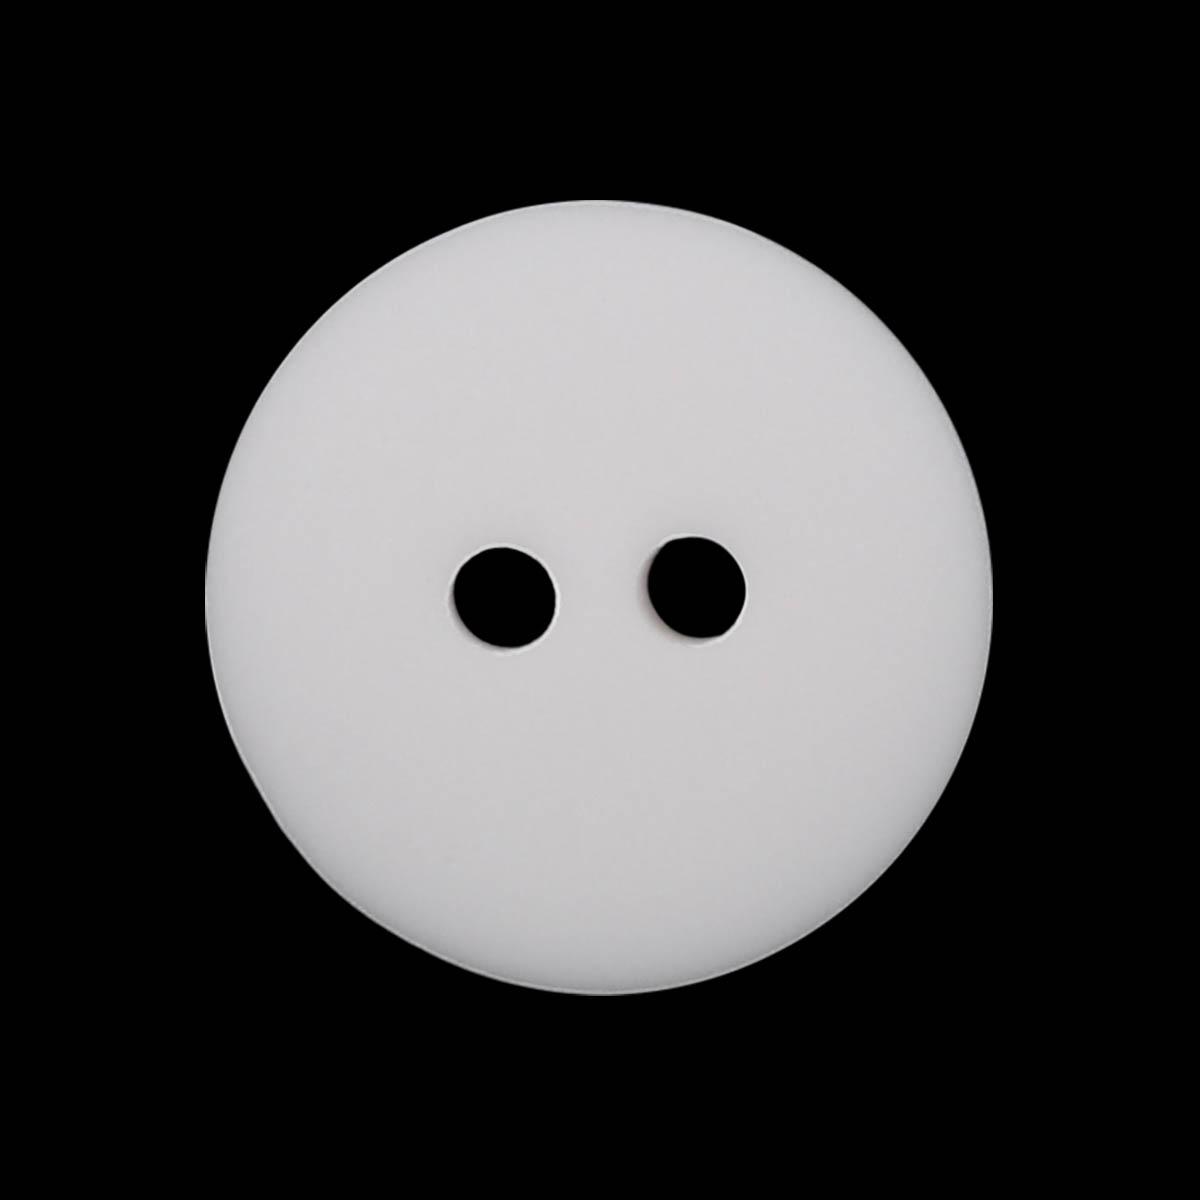 1108/2 24 (Бел/мат) Пуговица 2 прокола полиэстер